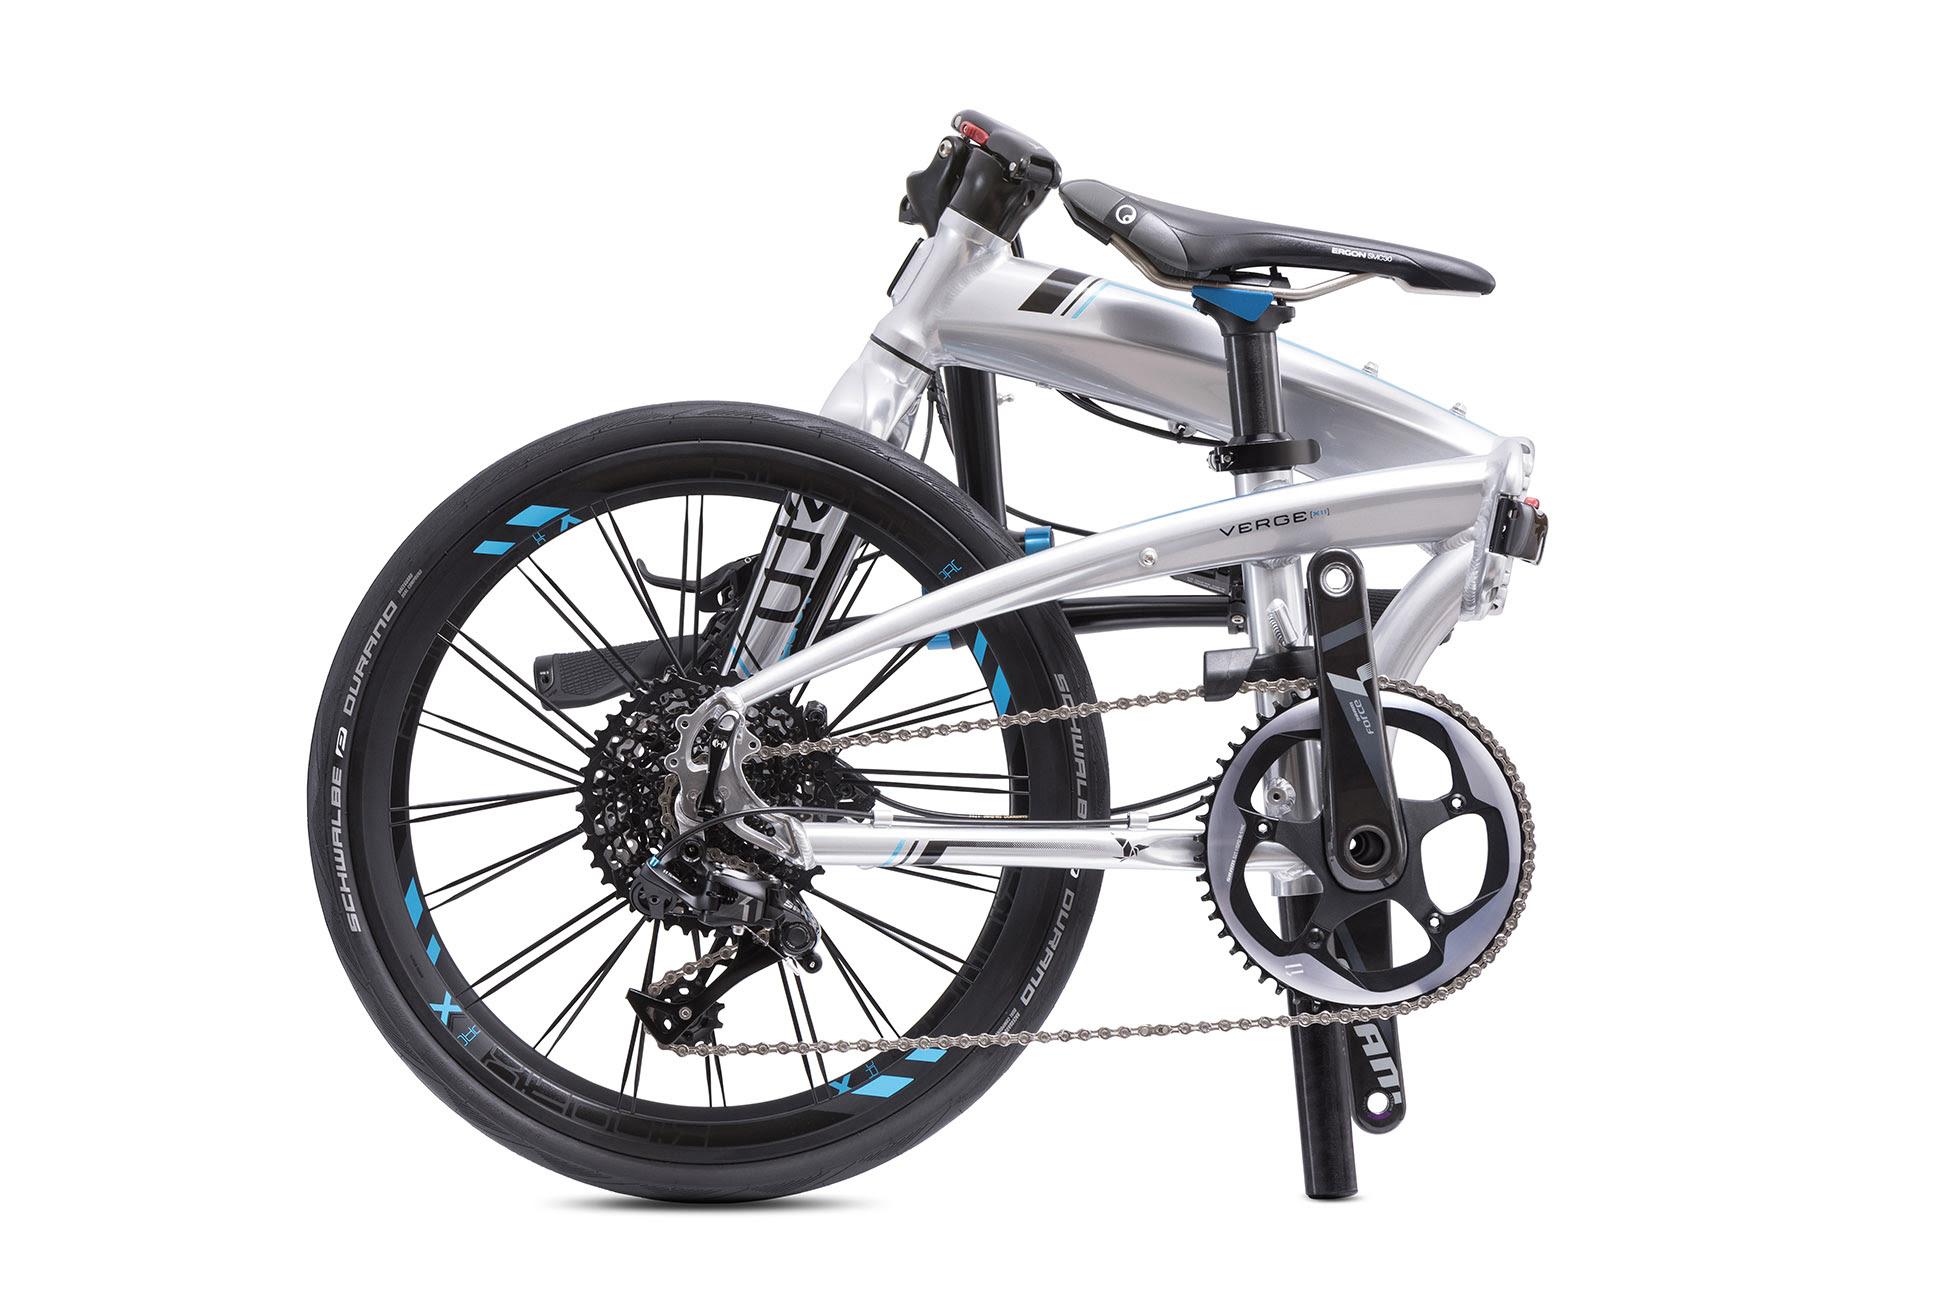 Image Result For Car Wheel Wheels